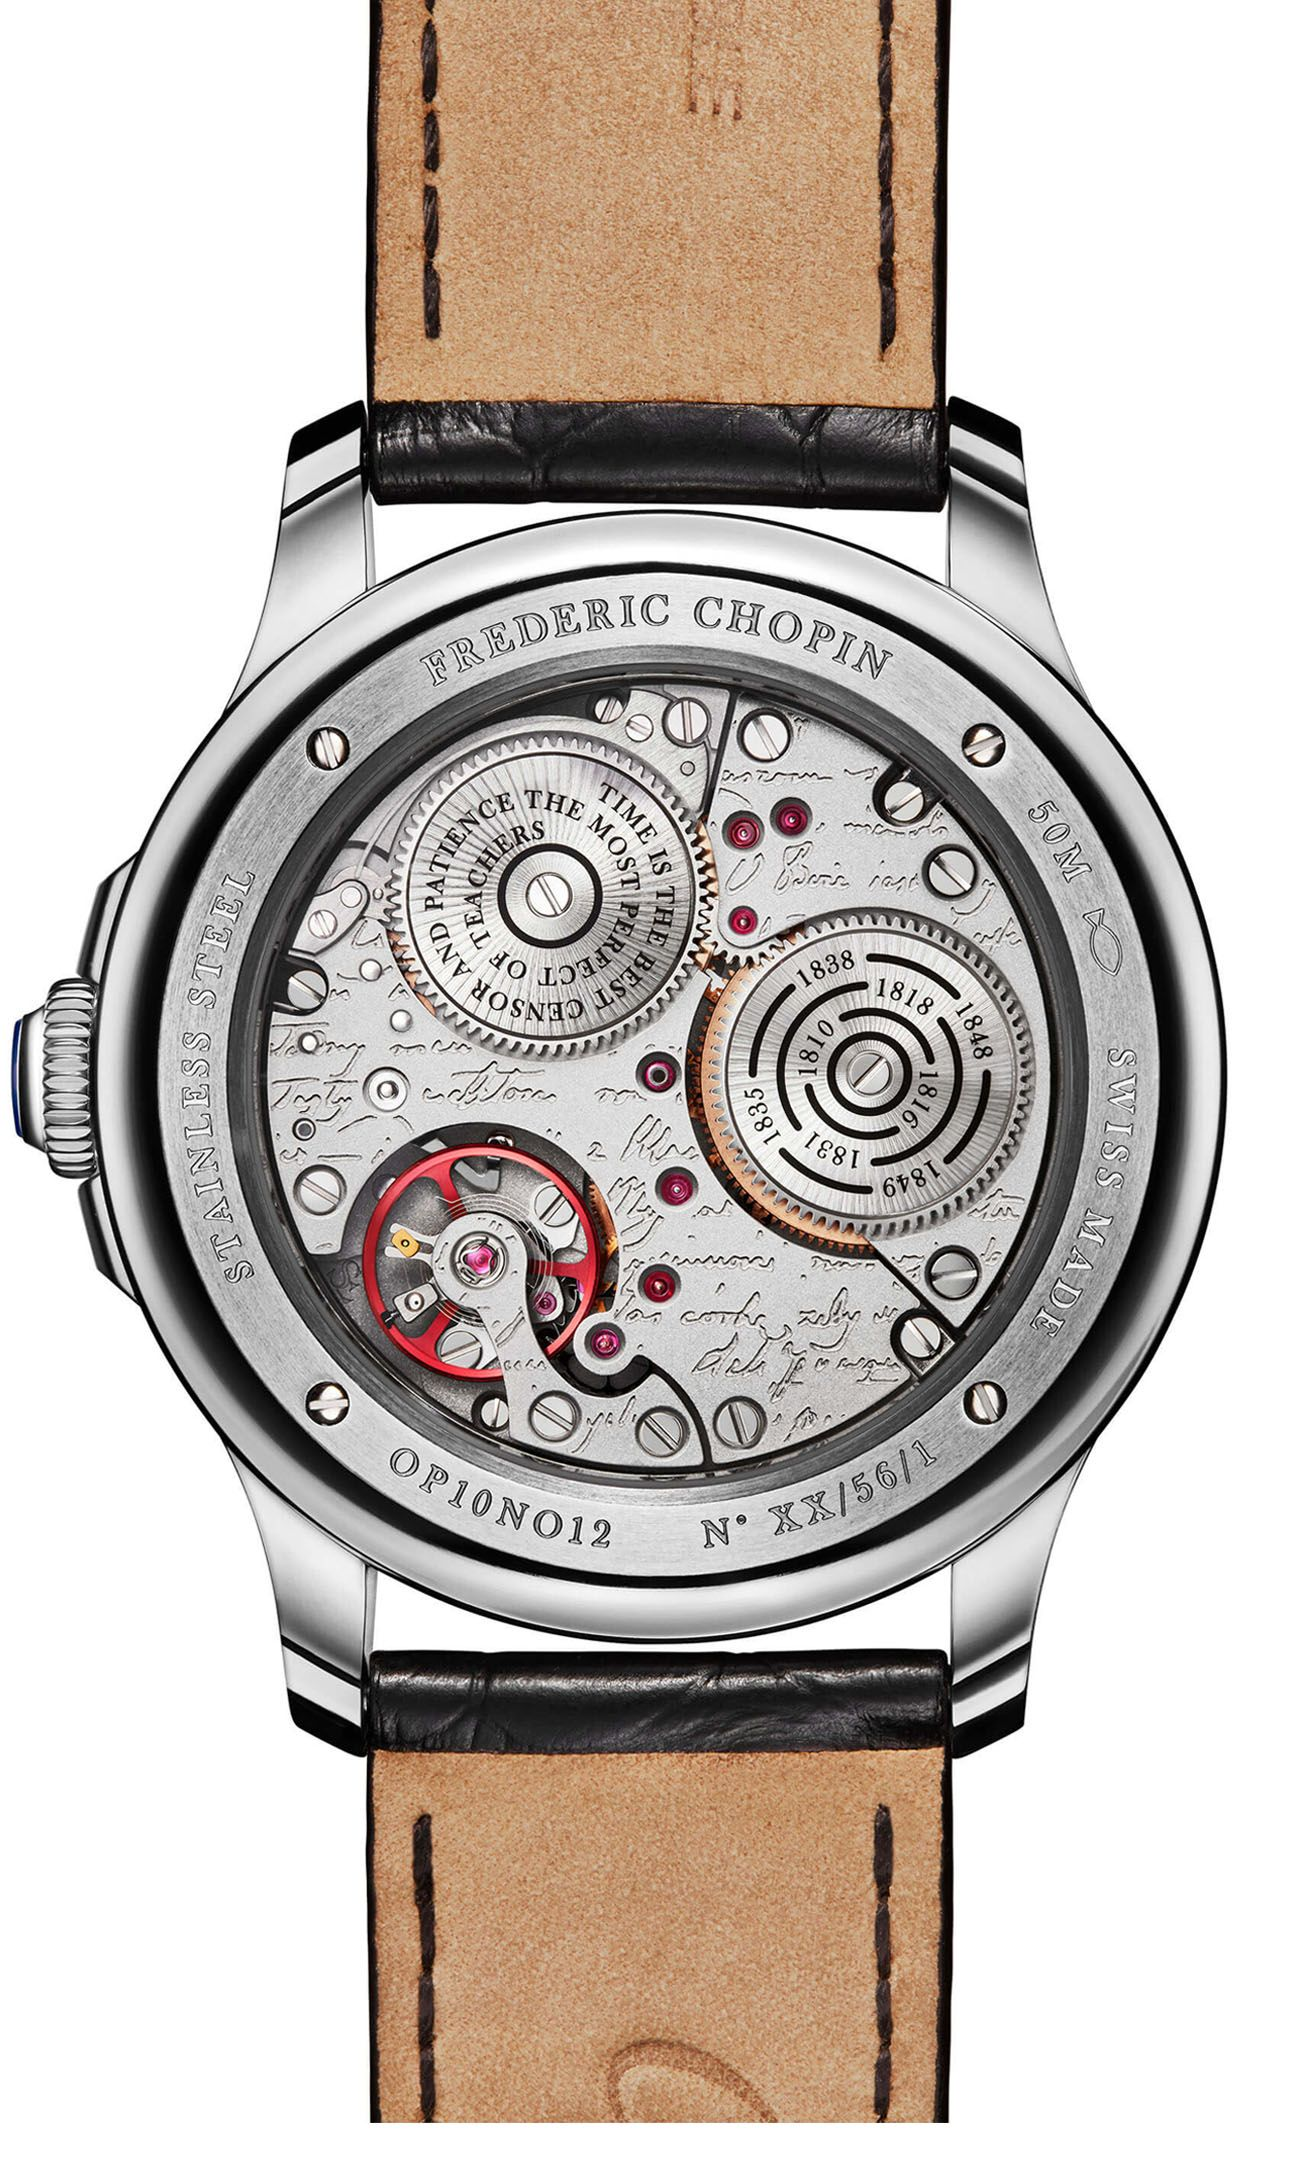 Chopin Watch Timepiece back